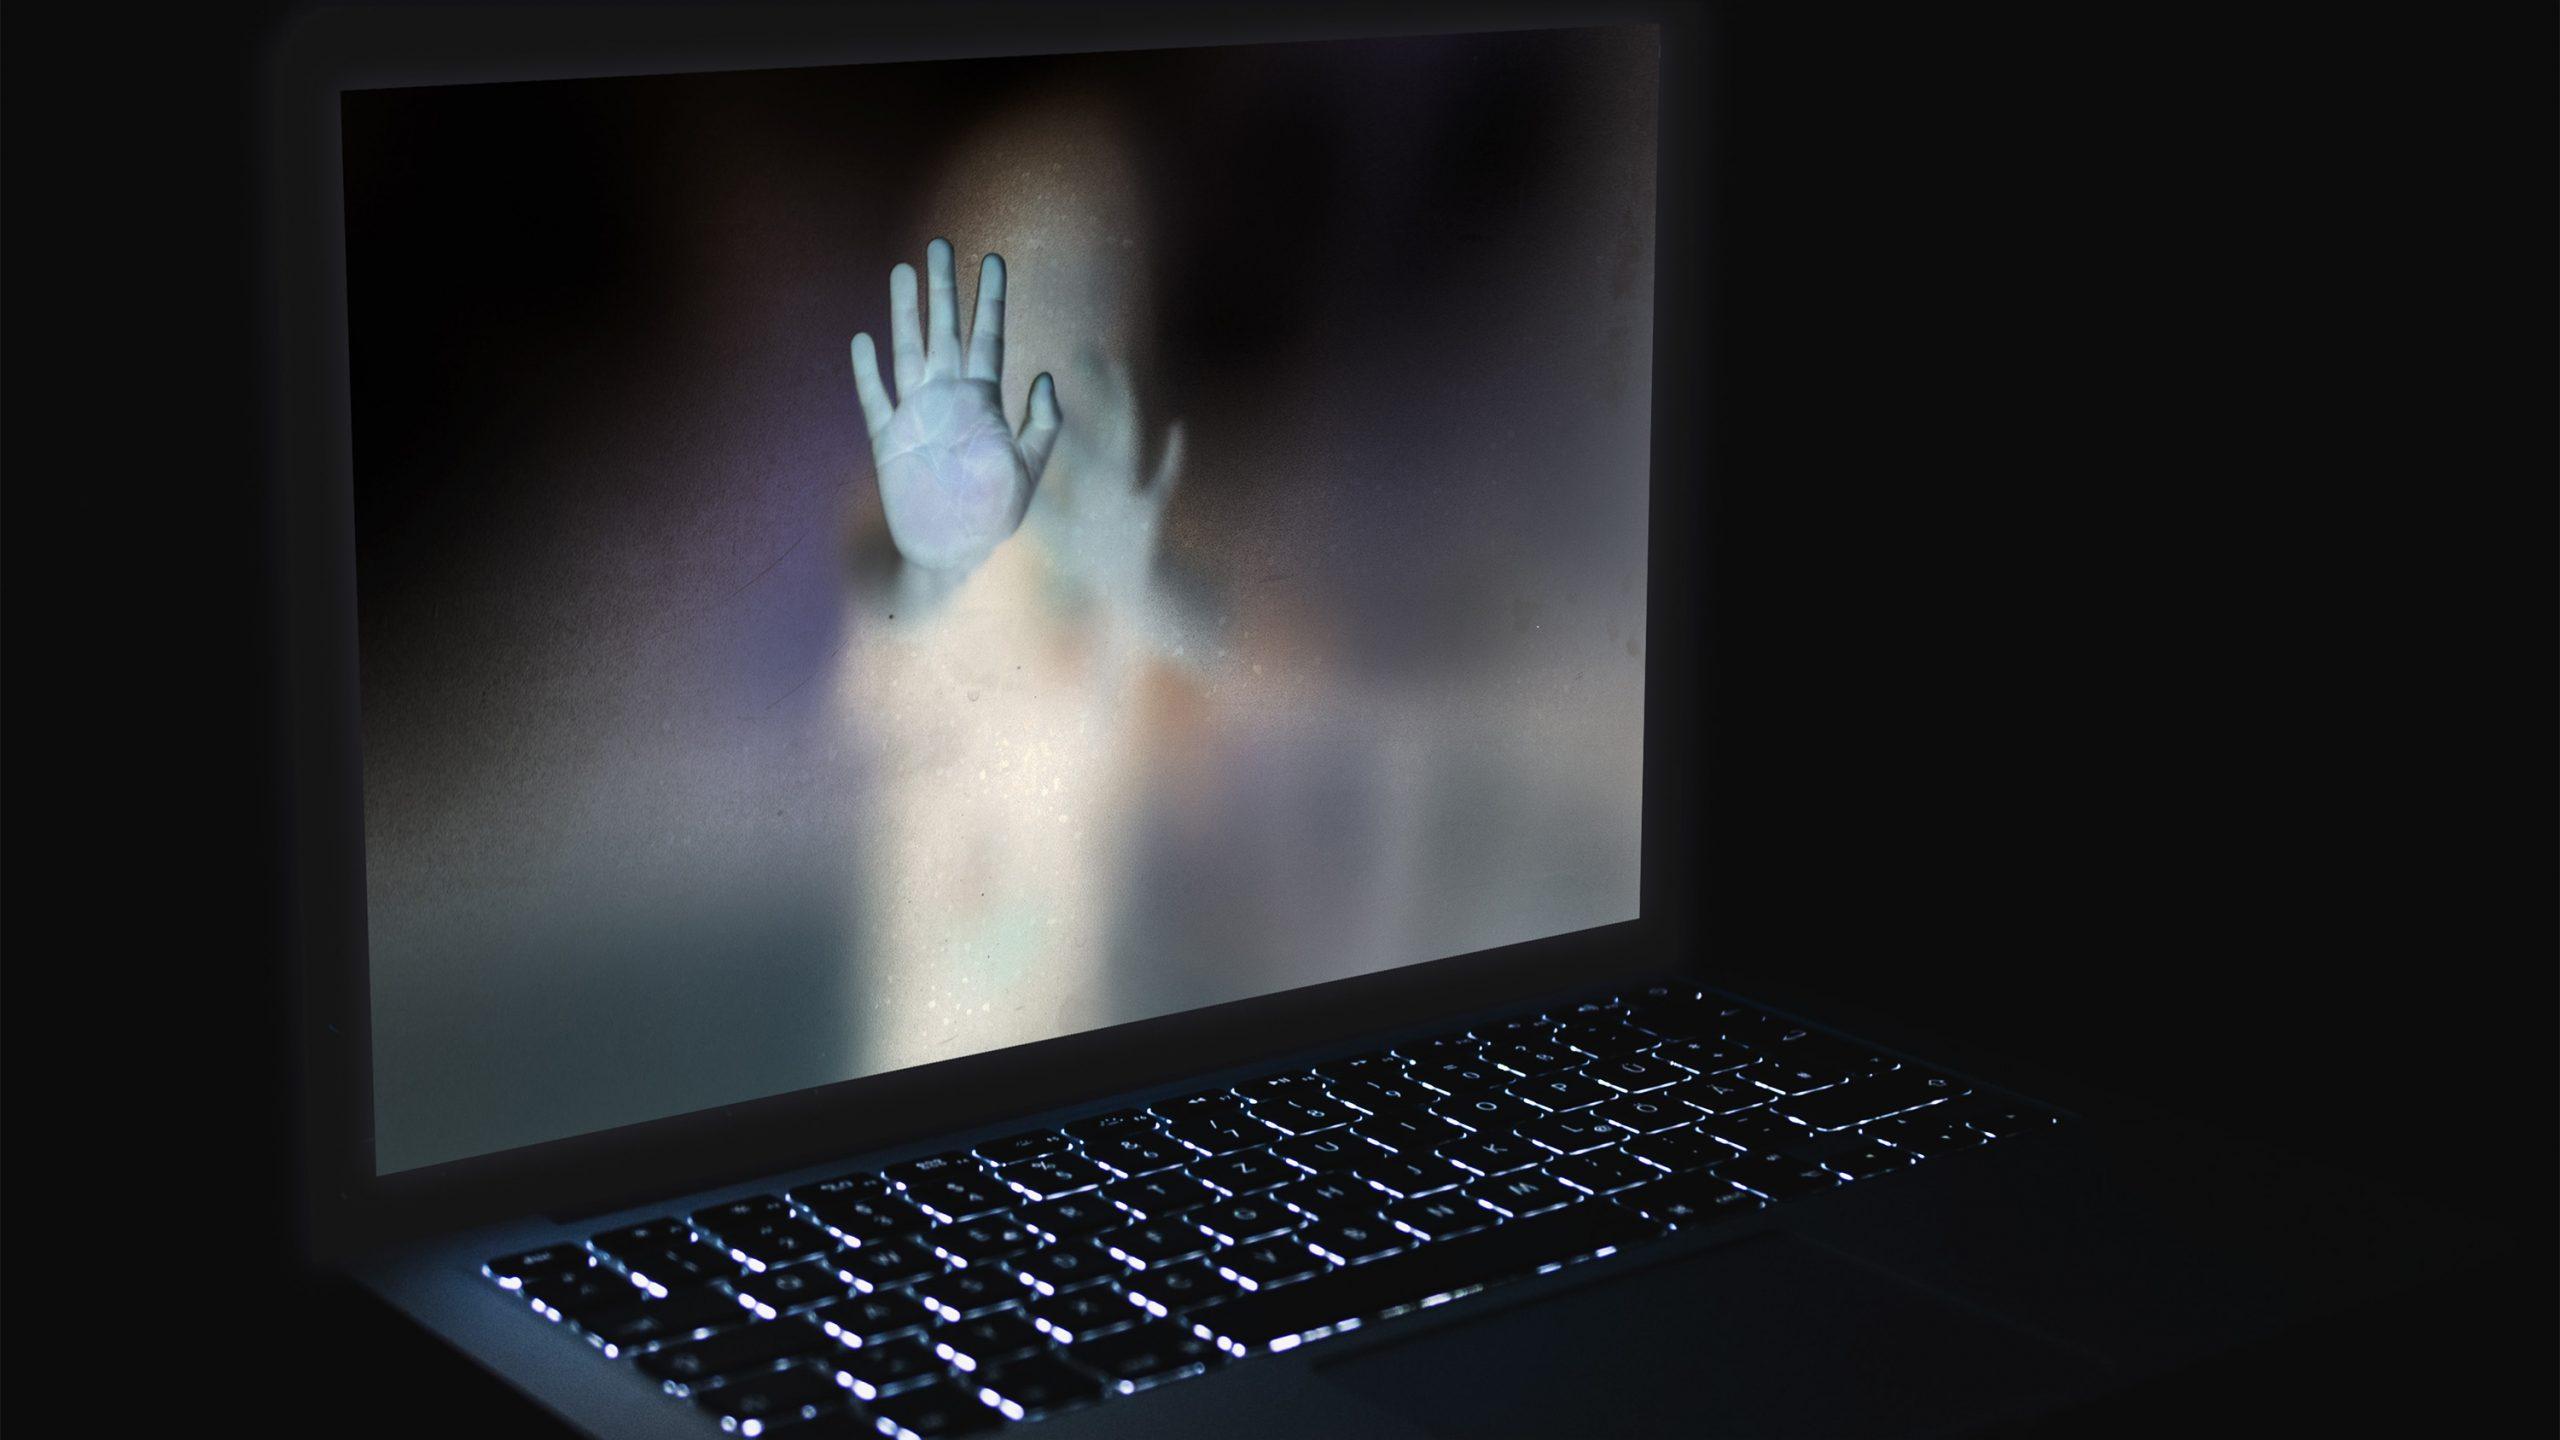 MIT Tech Review: 主張:機械学習の「参加型」アプローチはAI倫理の特効薬ではない